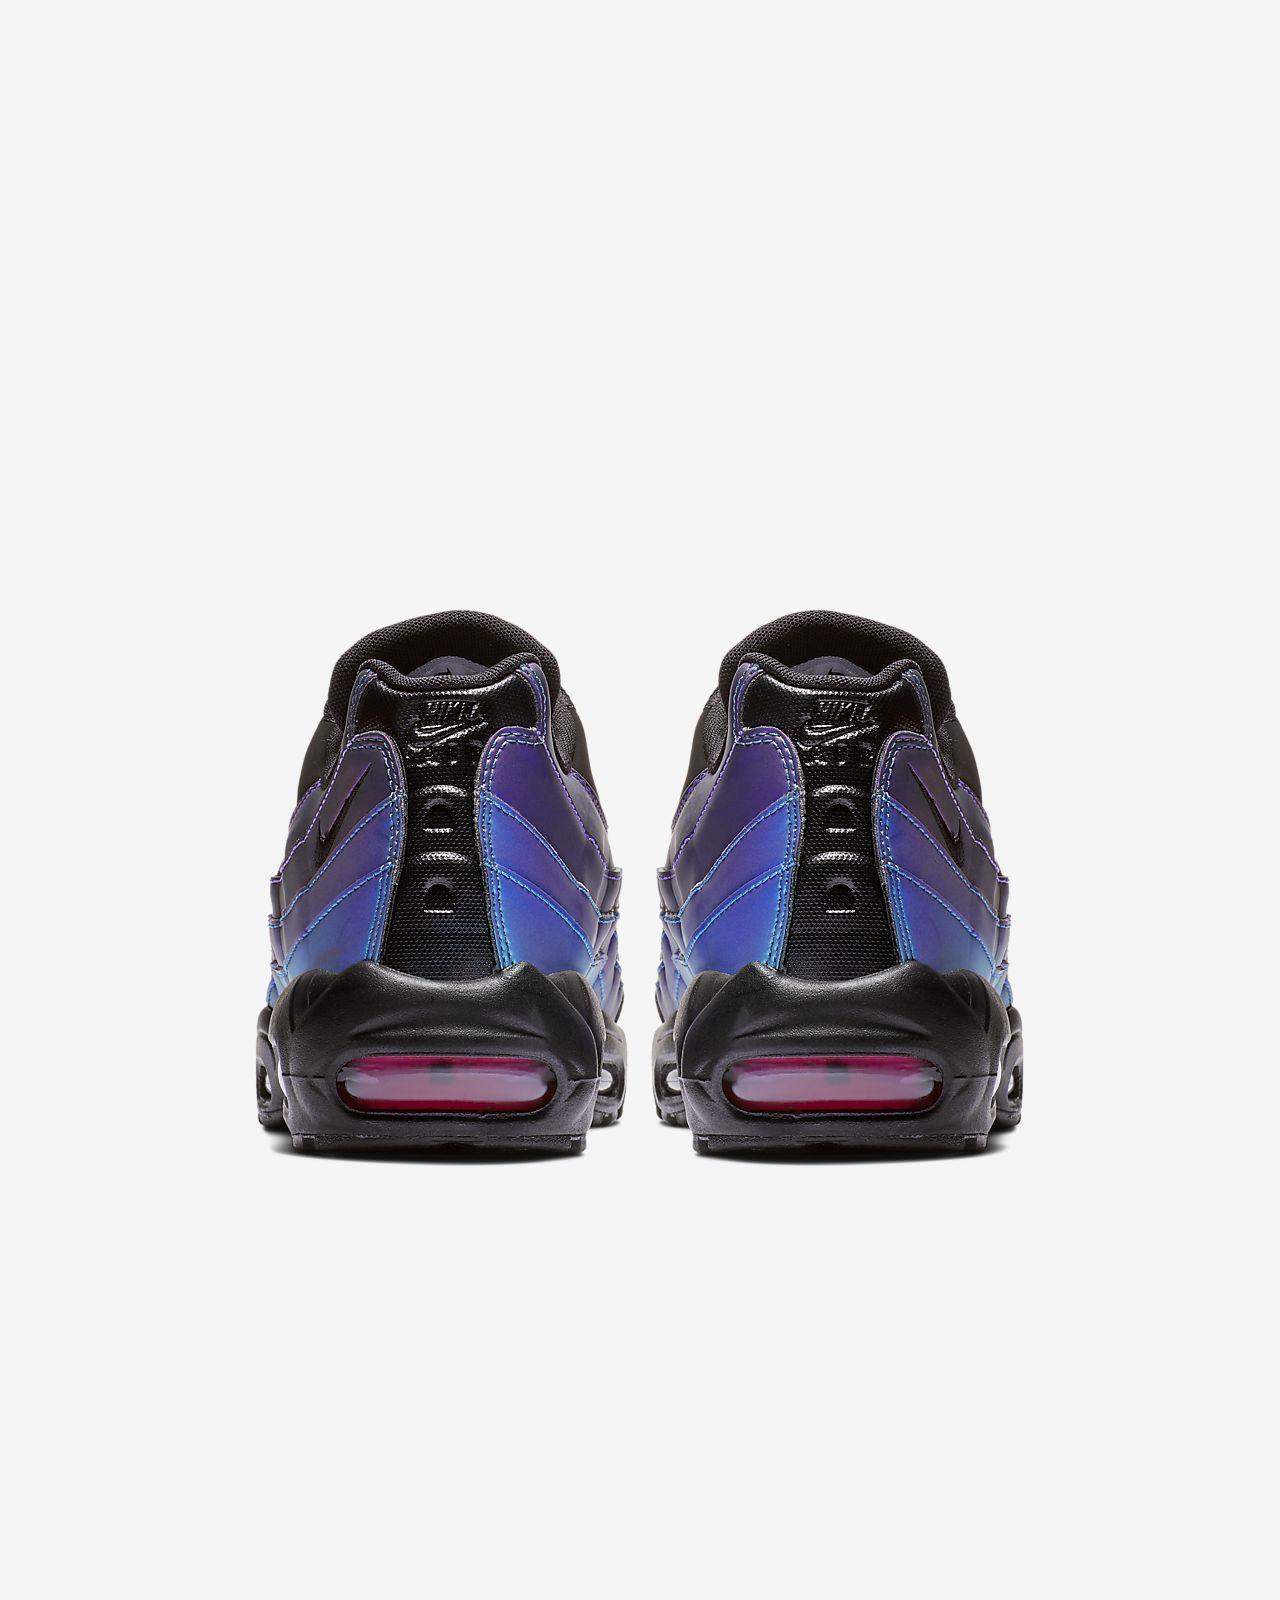 half off f1e7b e81c8 ... Sko Nike Air Max 95 Premium för män